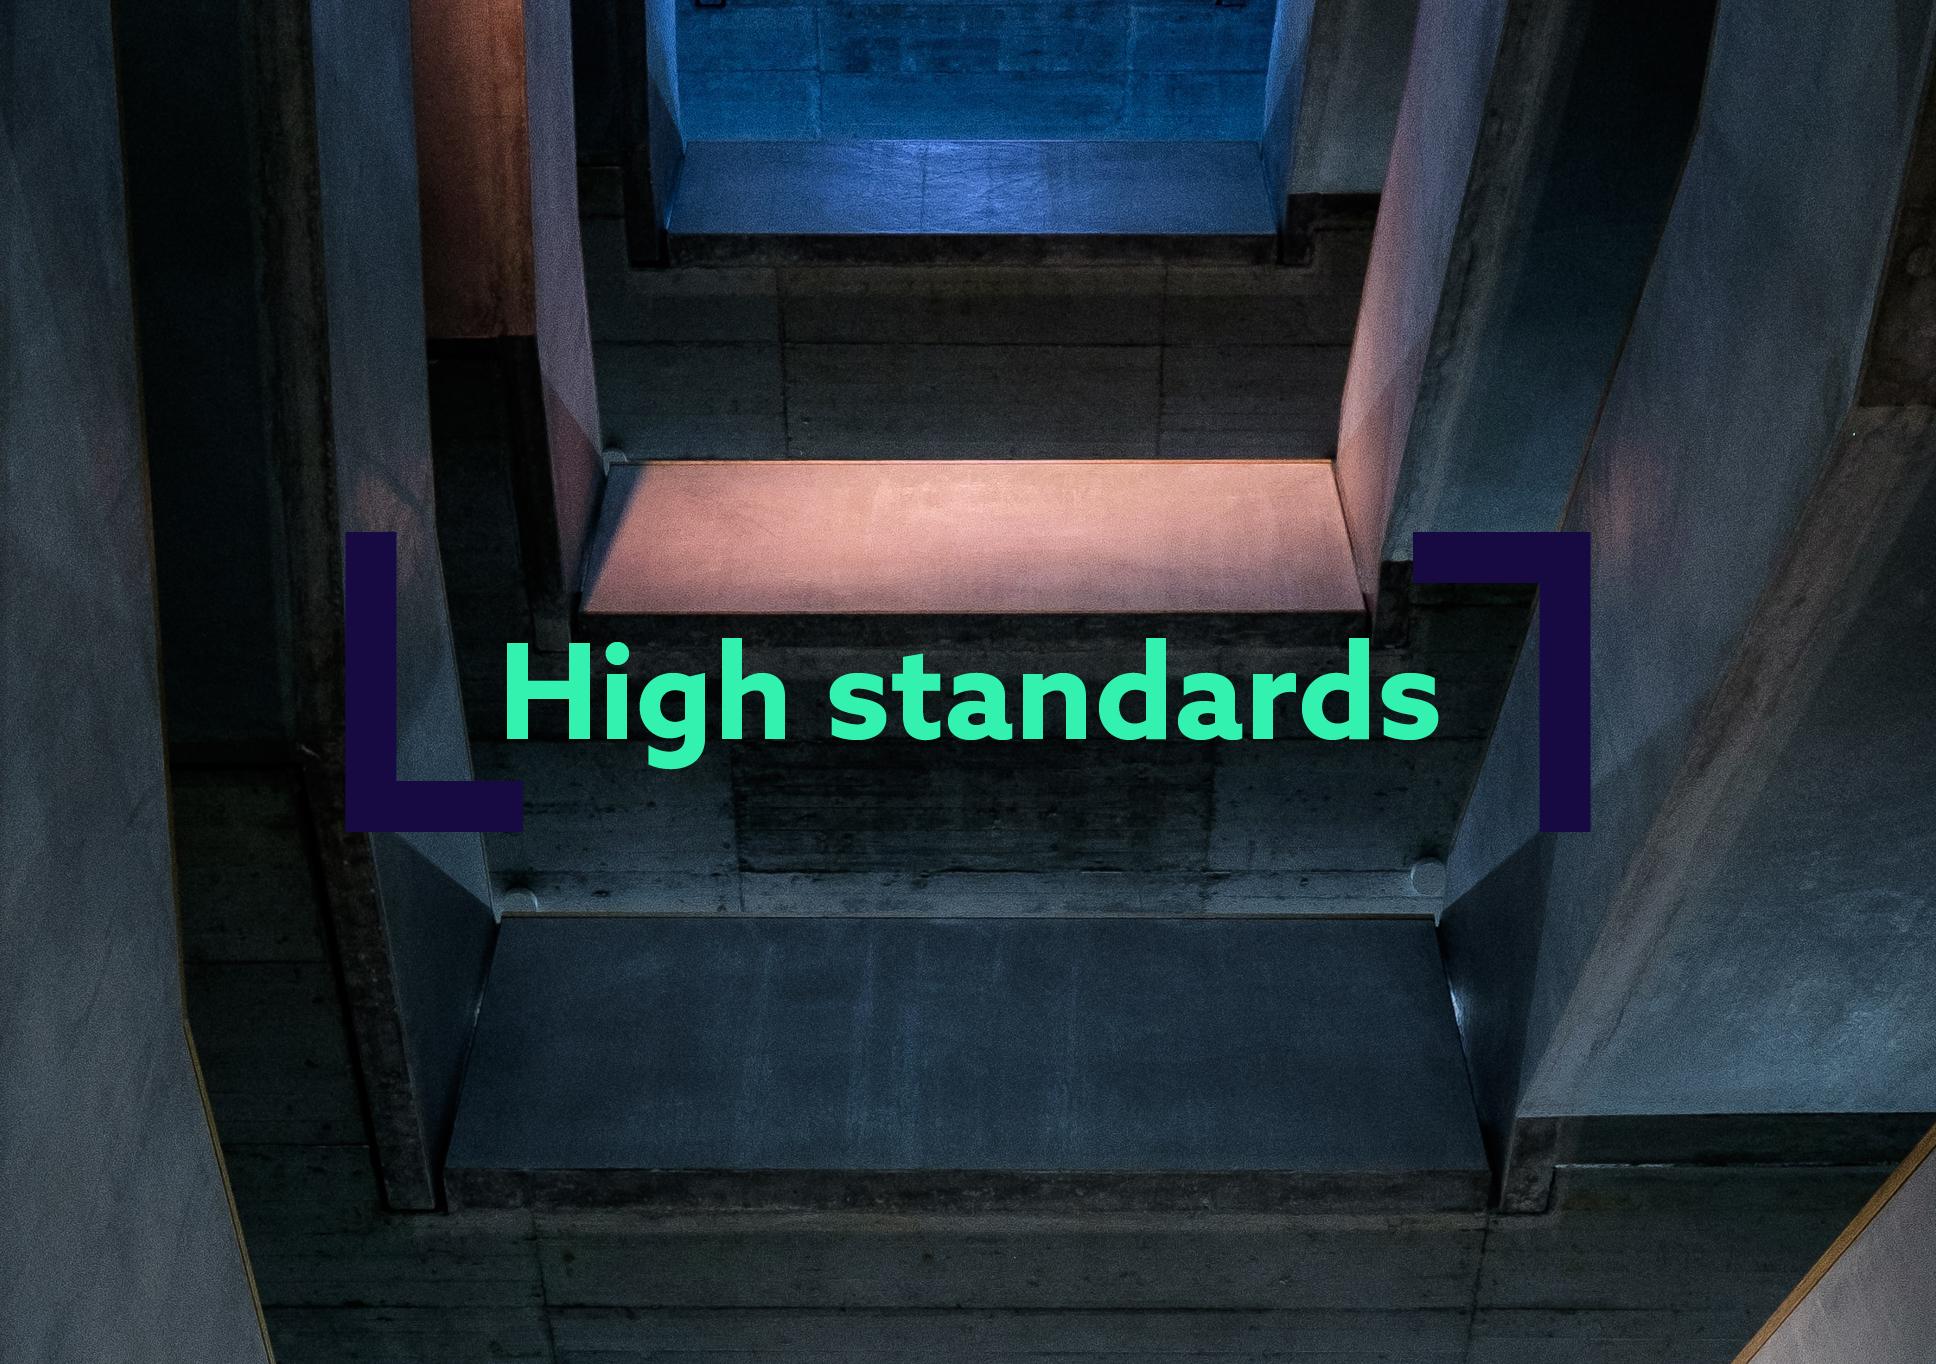 Alta - high standards